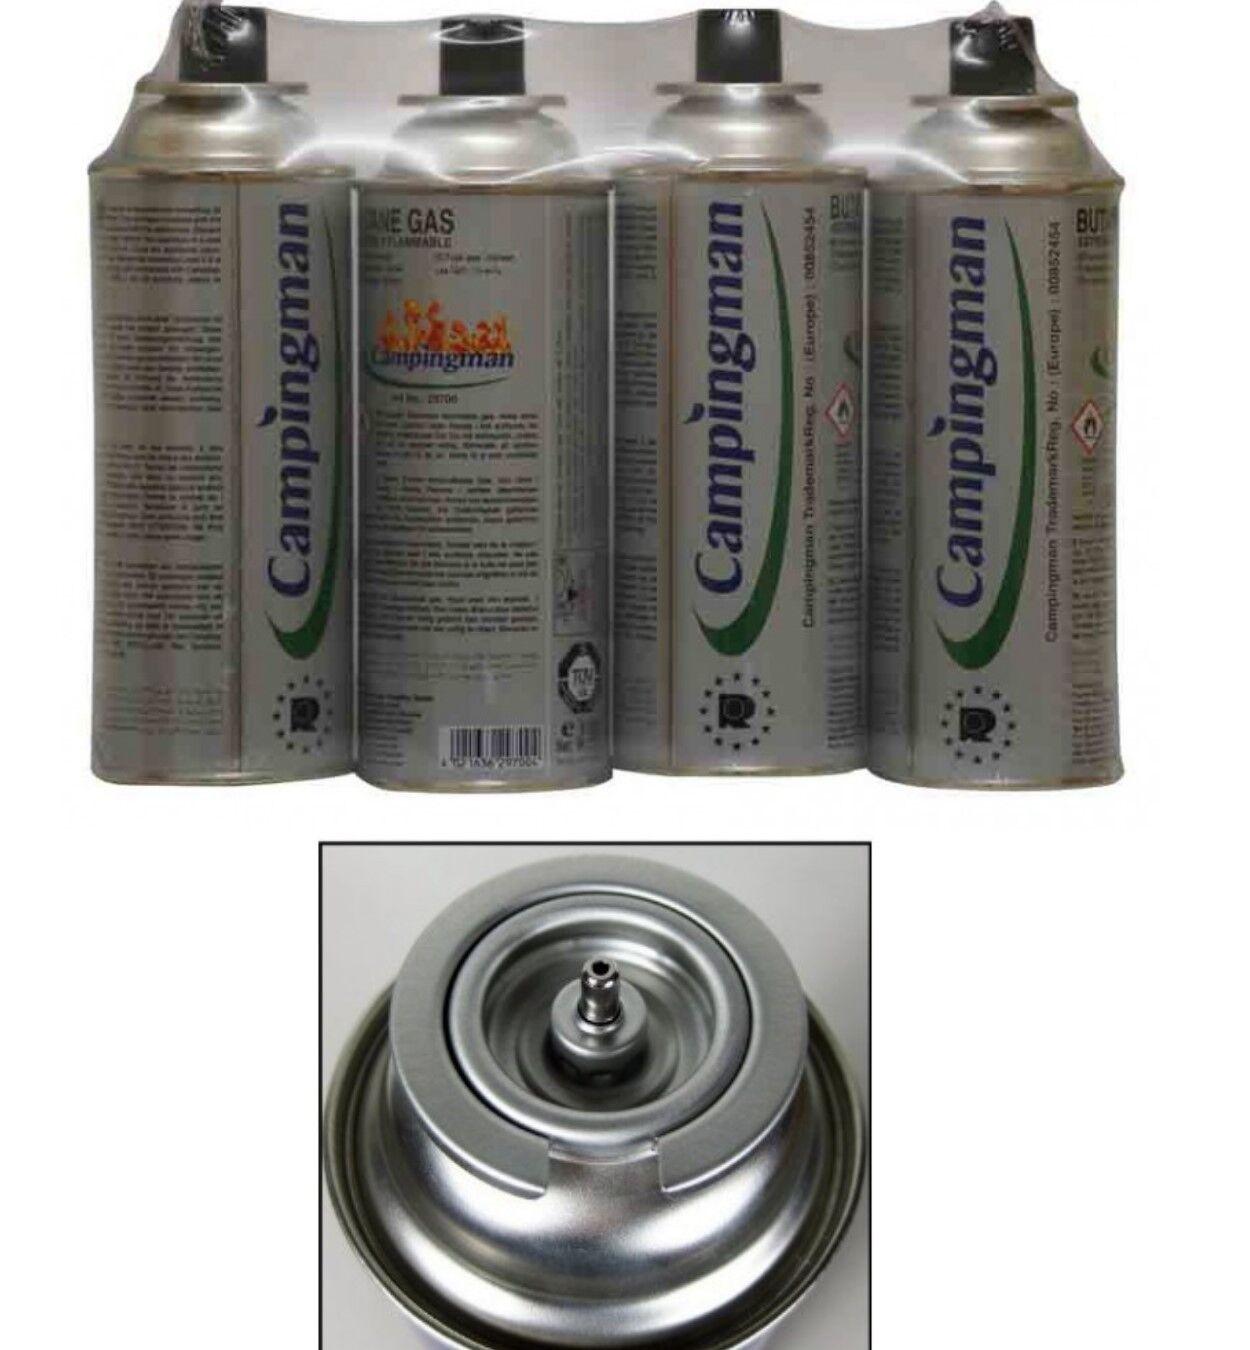 24 x butangas cartouche 227ml bouteille butane gaz cartouche butangas 227g pour camping réchaud four 391521